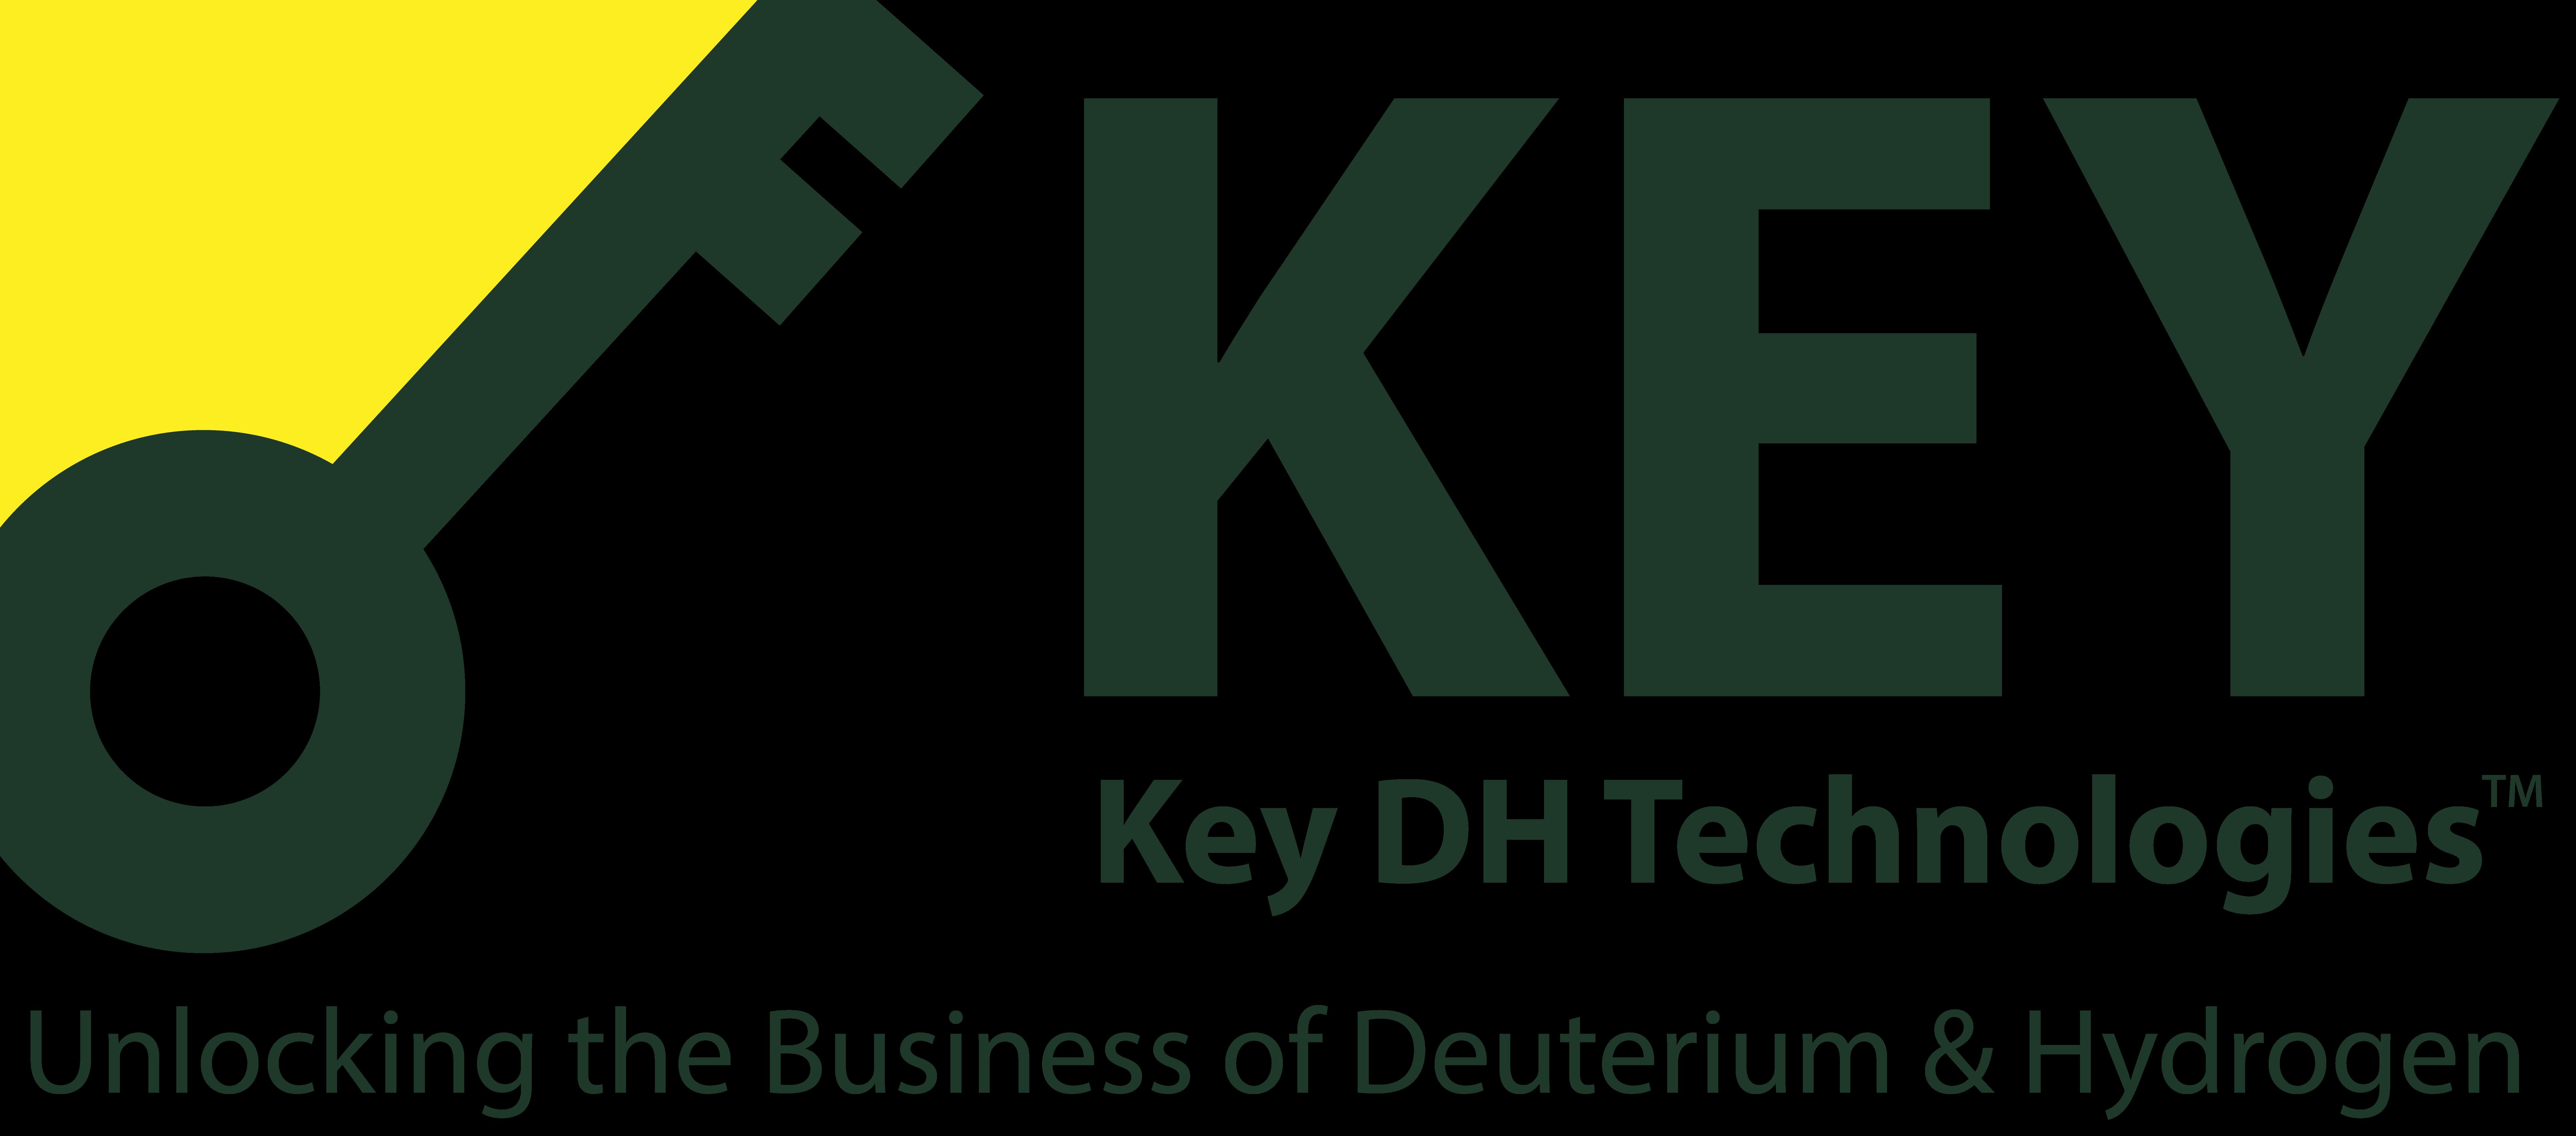 Key DH Technologies Inc.,